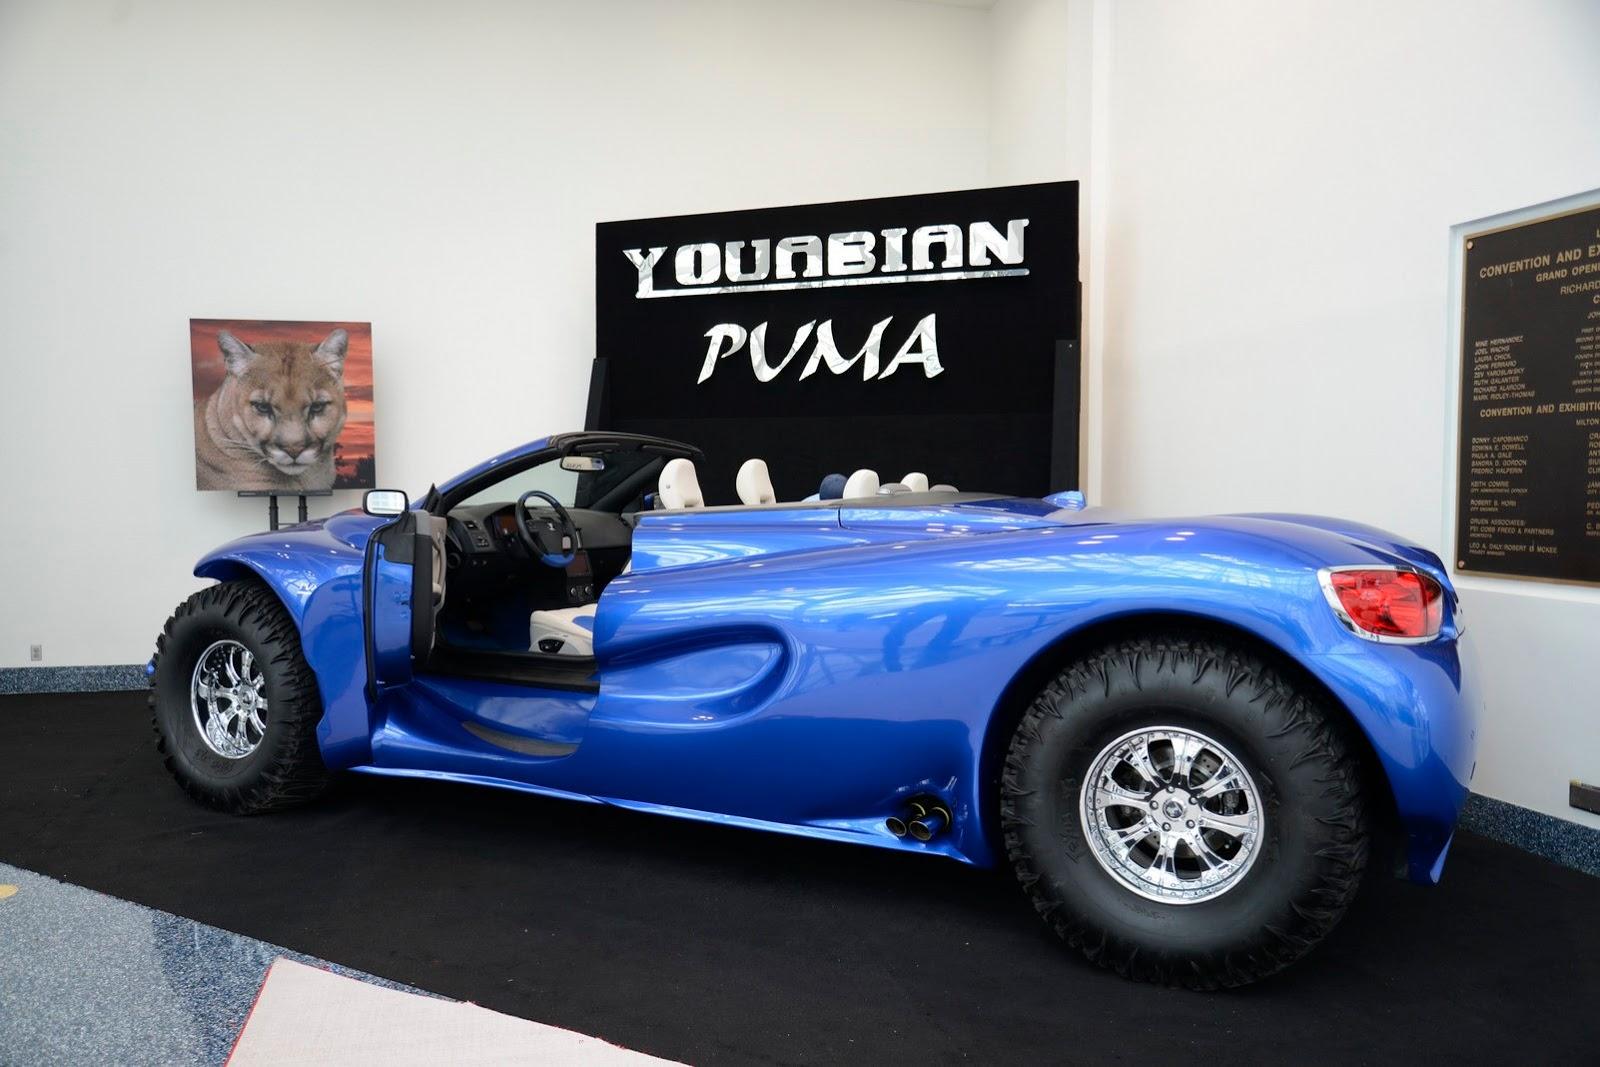 Youabian-Puma-1%25255B2%25255D.jpg